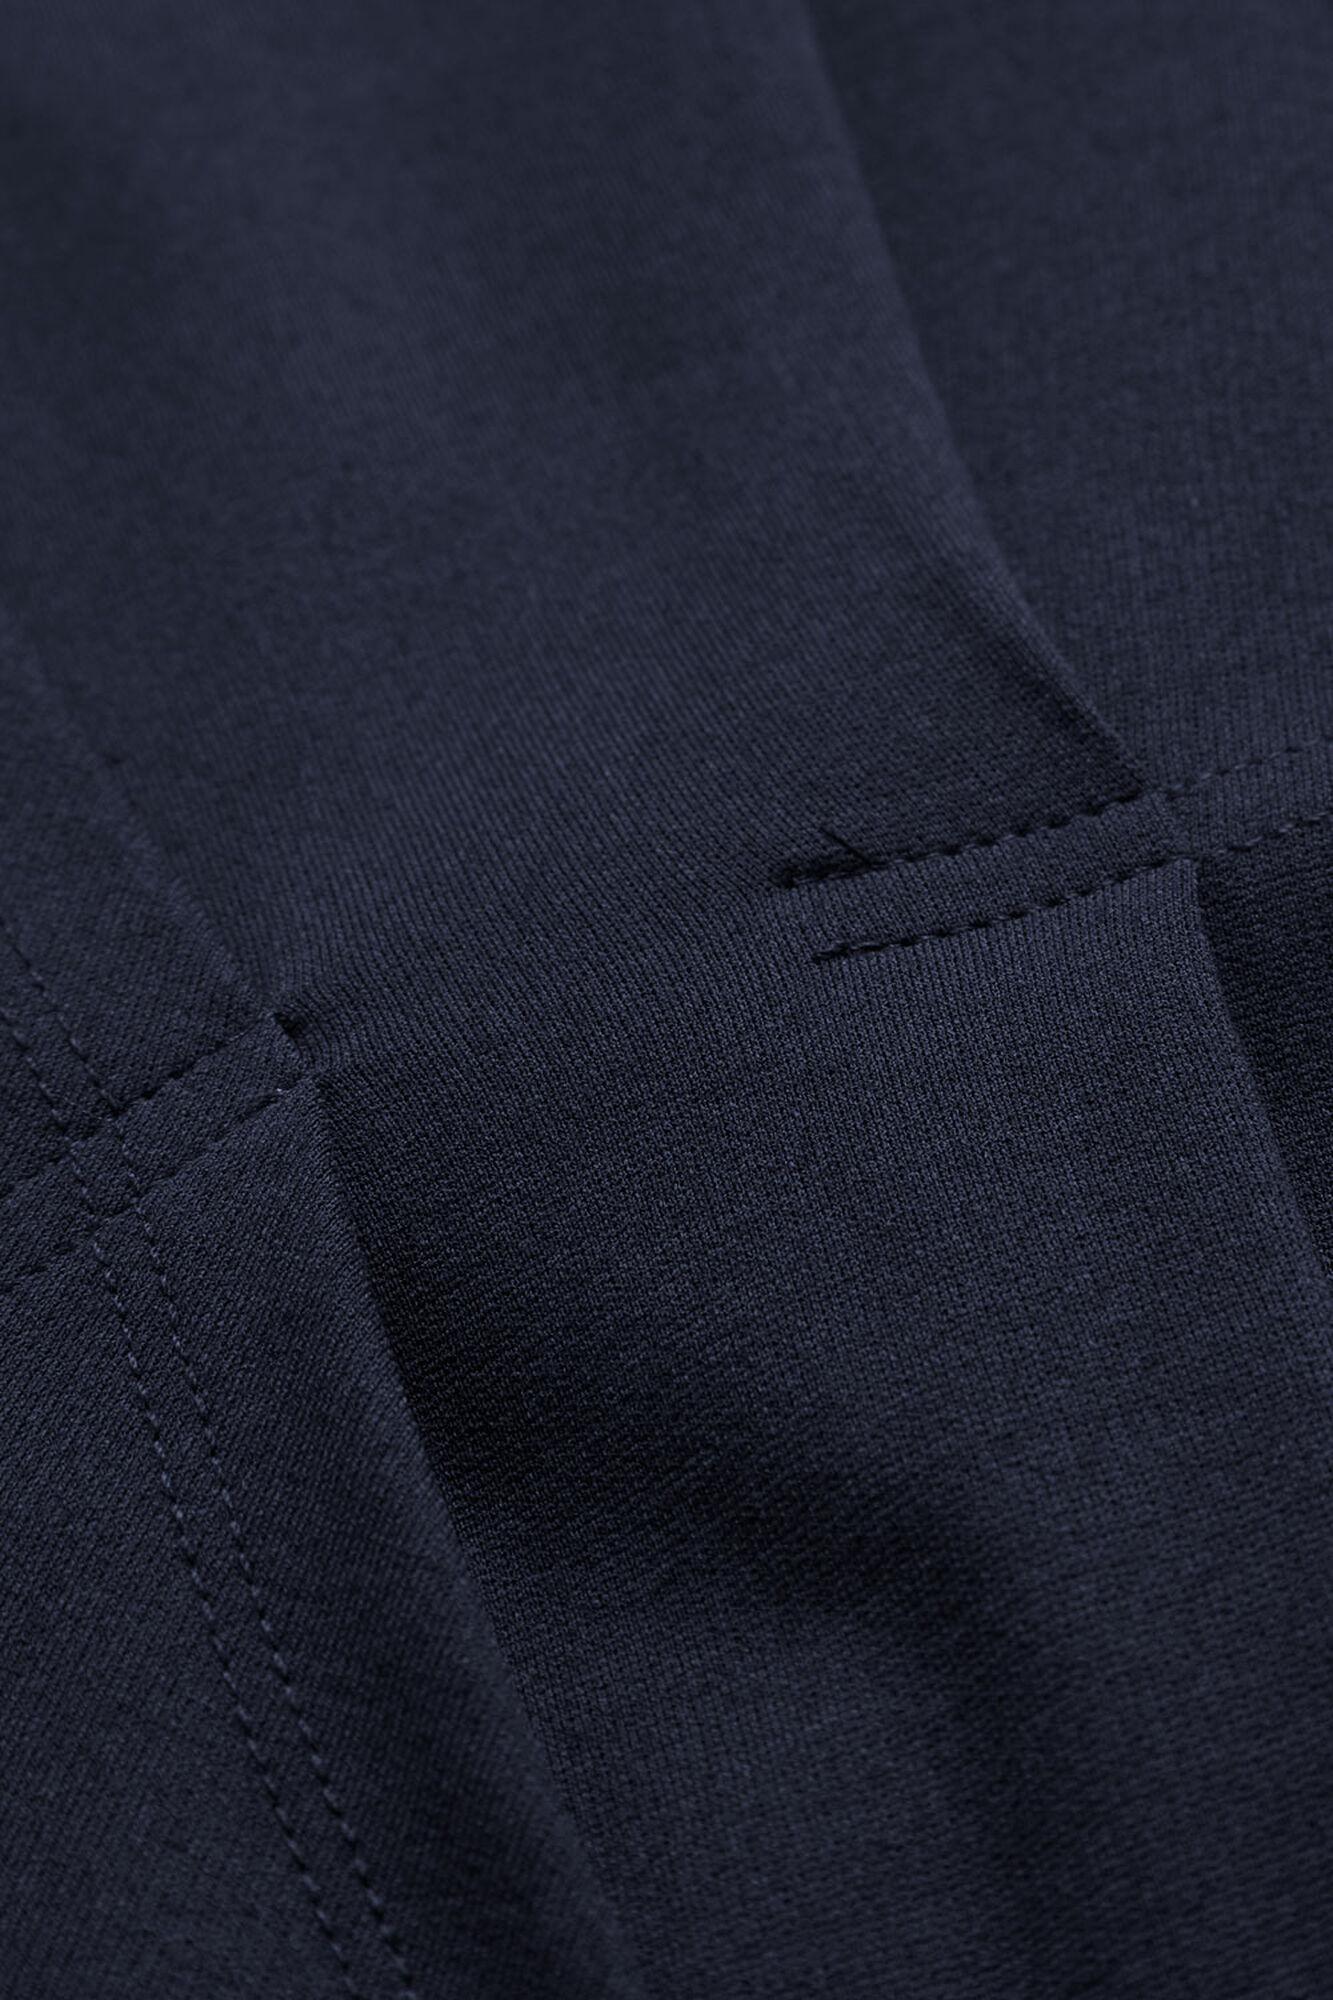 NIKIS DRESS, Navy, hi-res